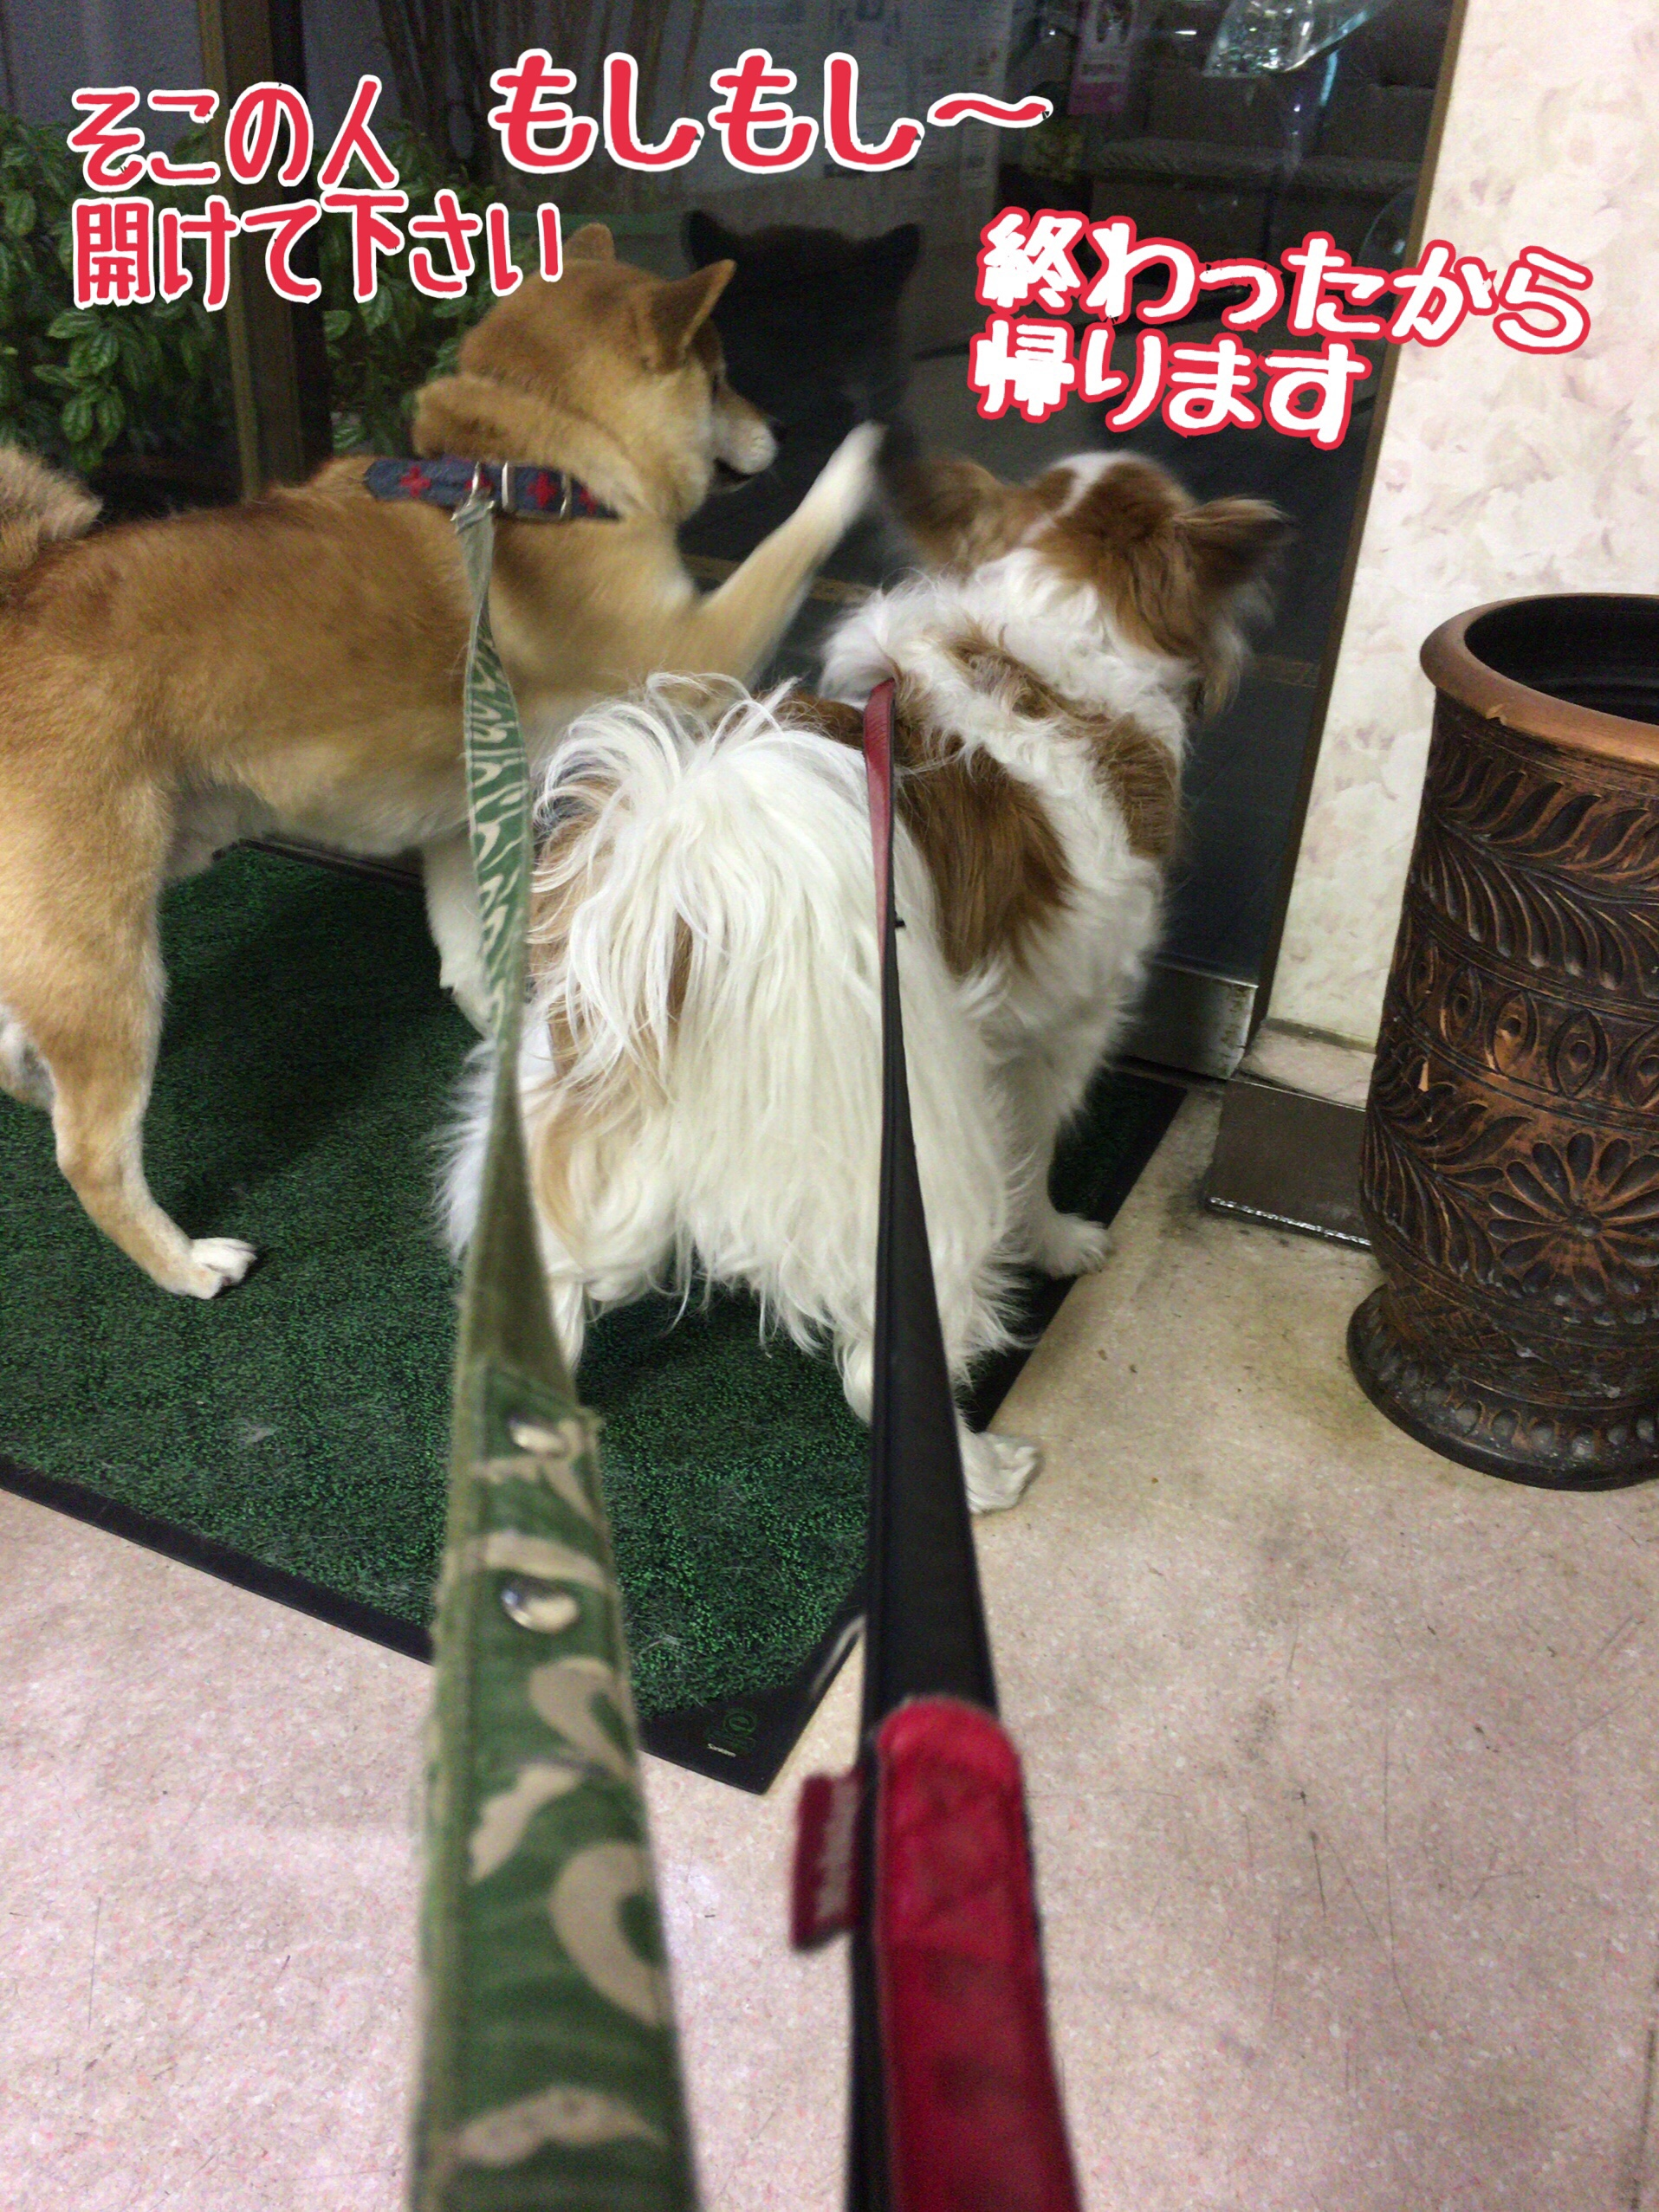 fc2blog_20170407110249683.jpg